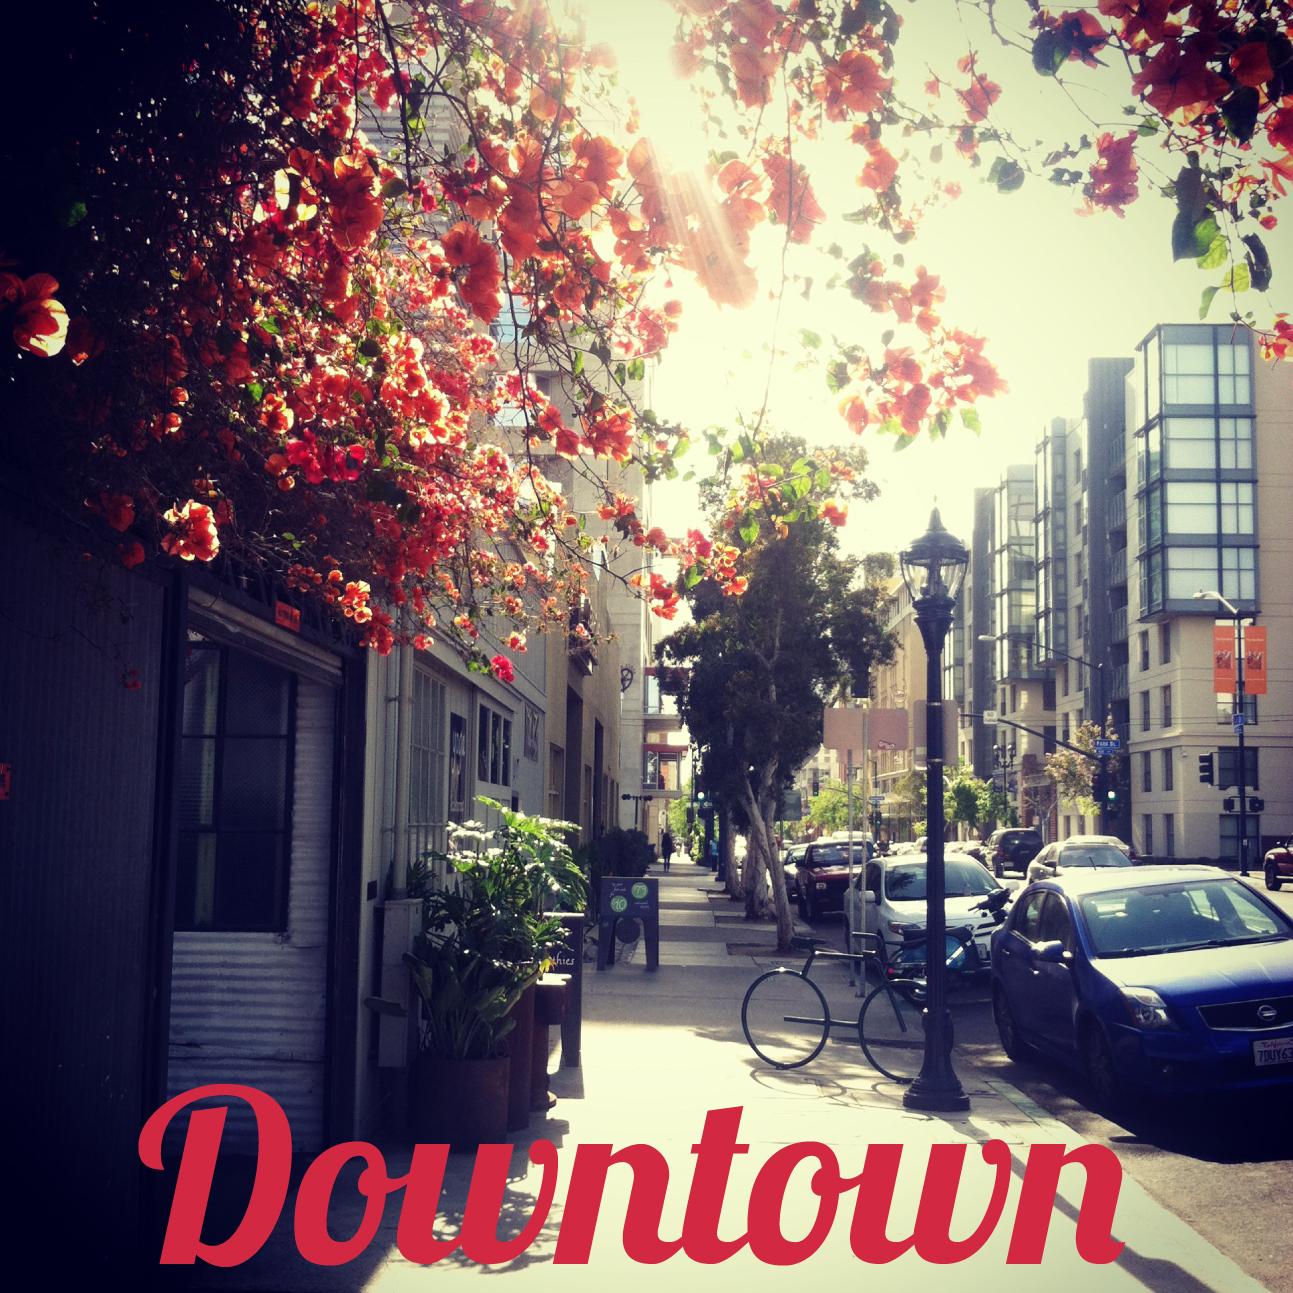 Downtown_print.jpg